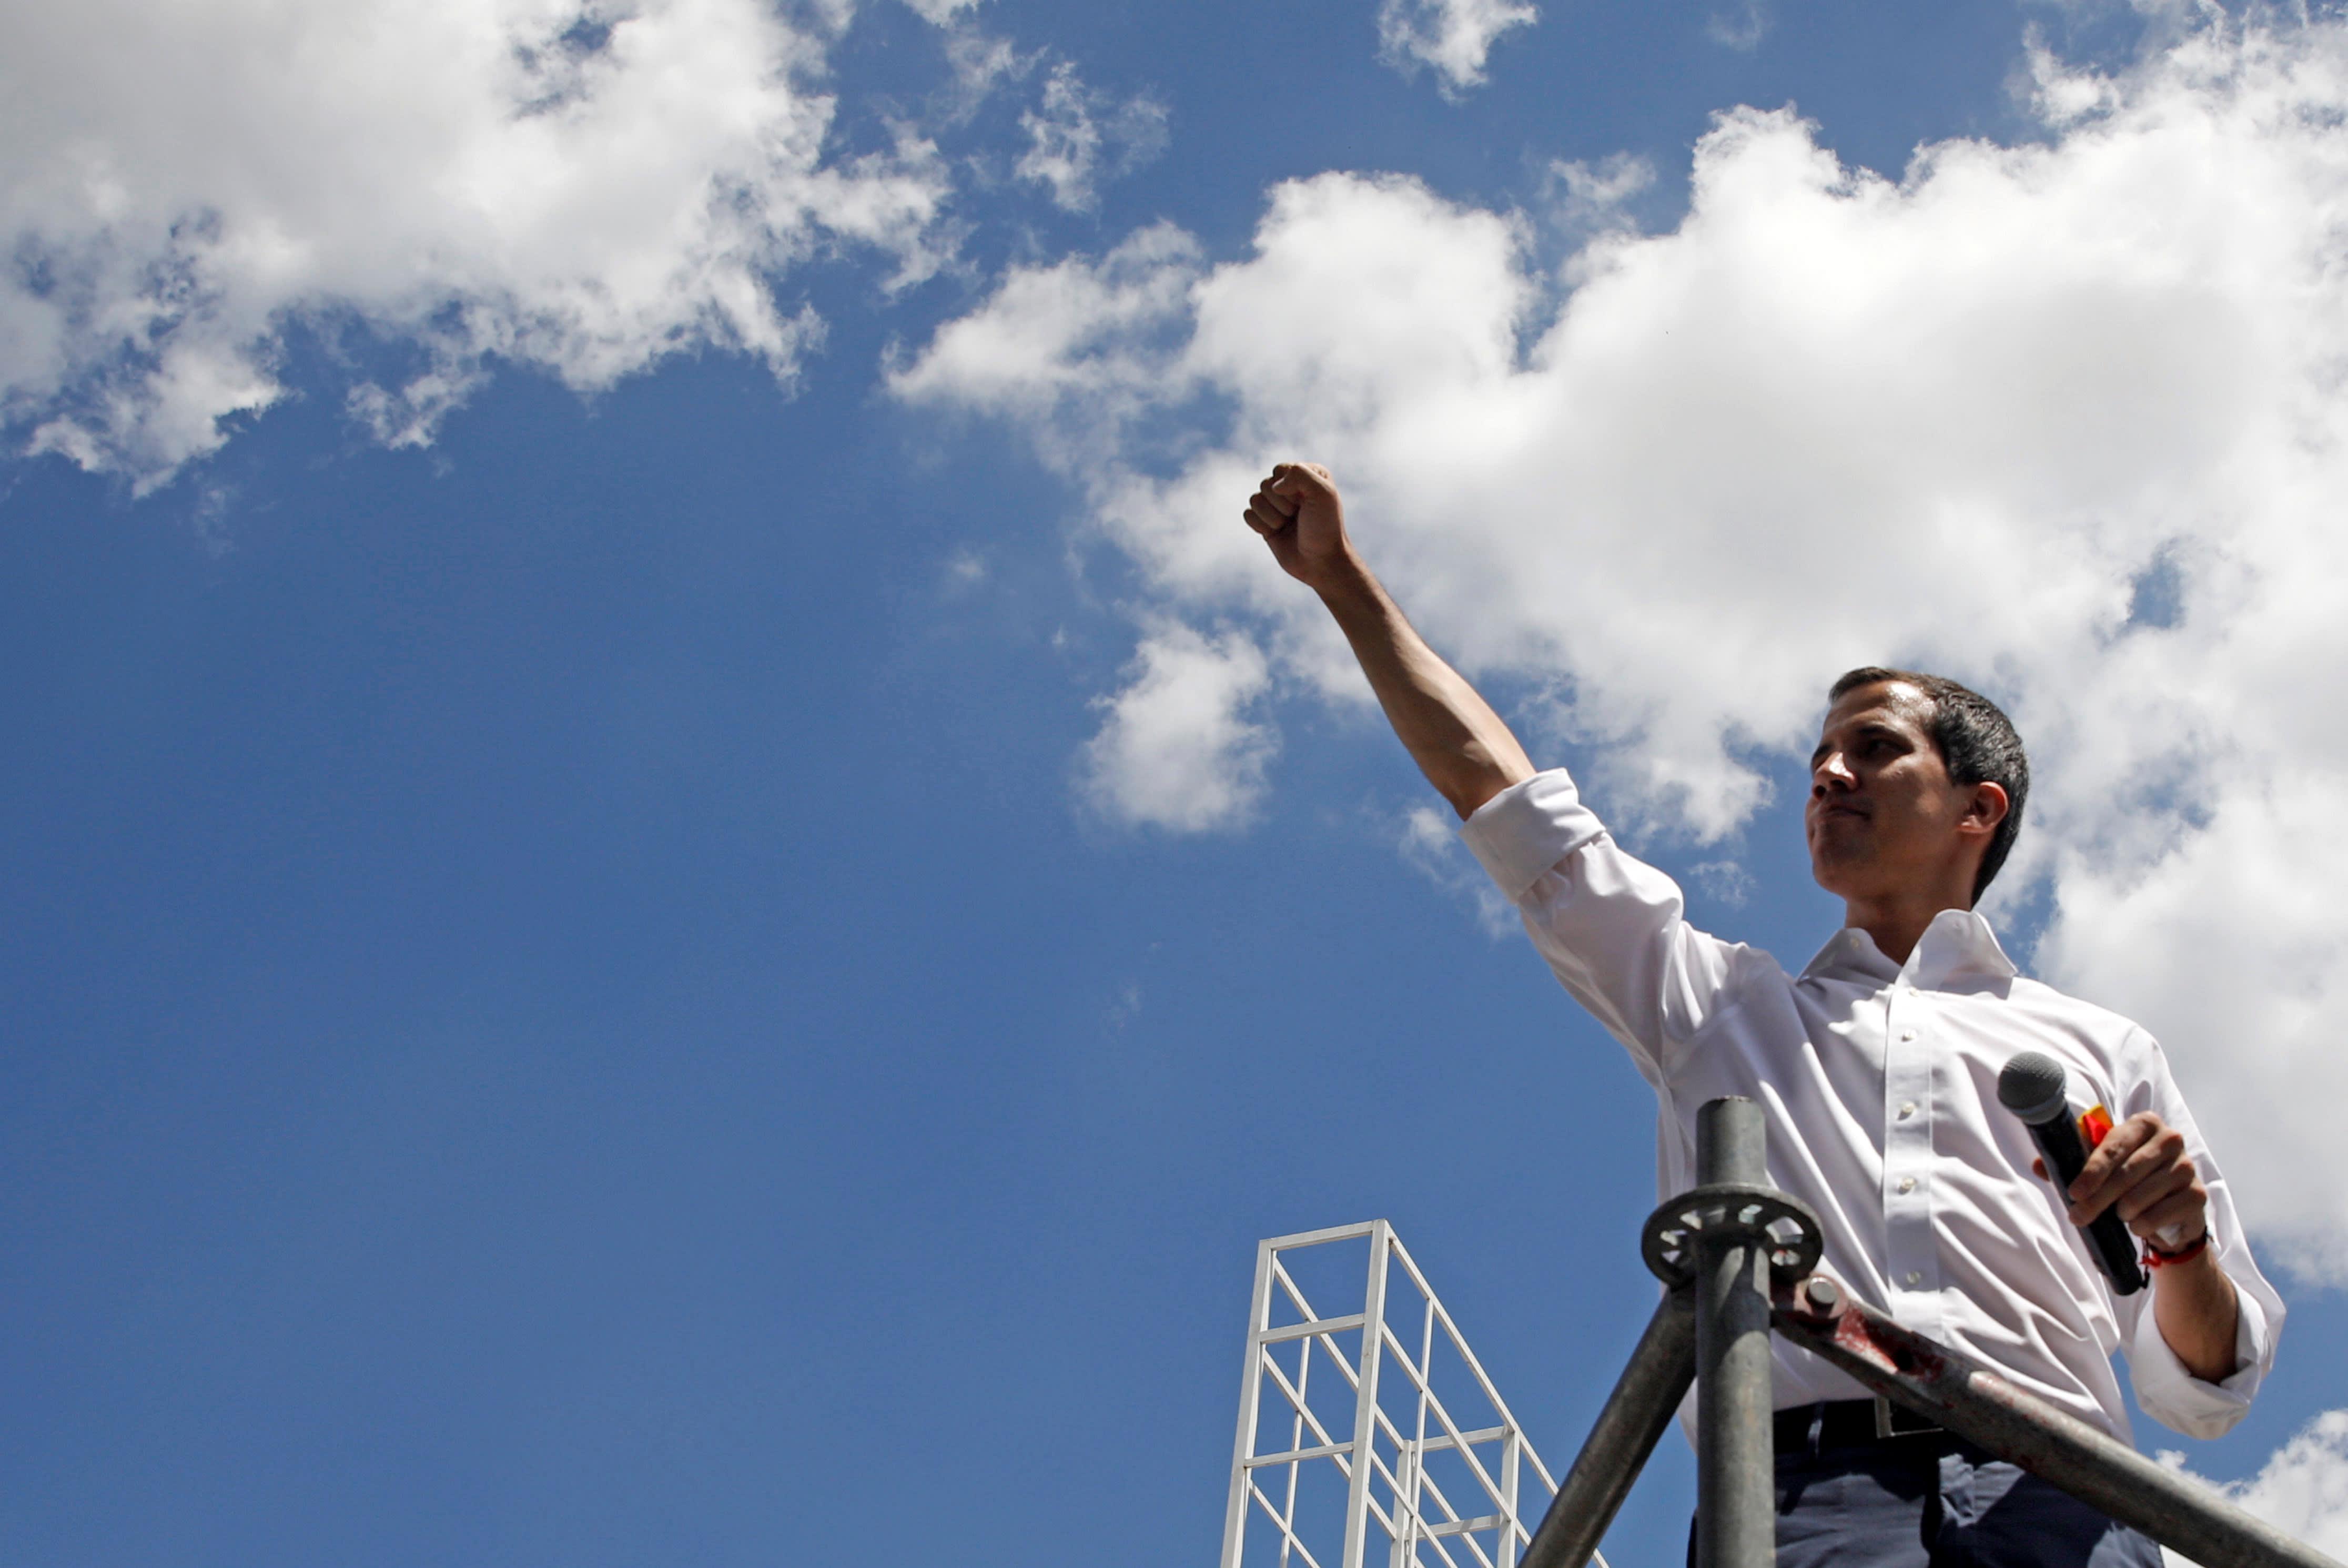 'Everyone is afraid': Venezuela's opposition prepares for aid showdown against Maduro